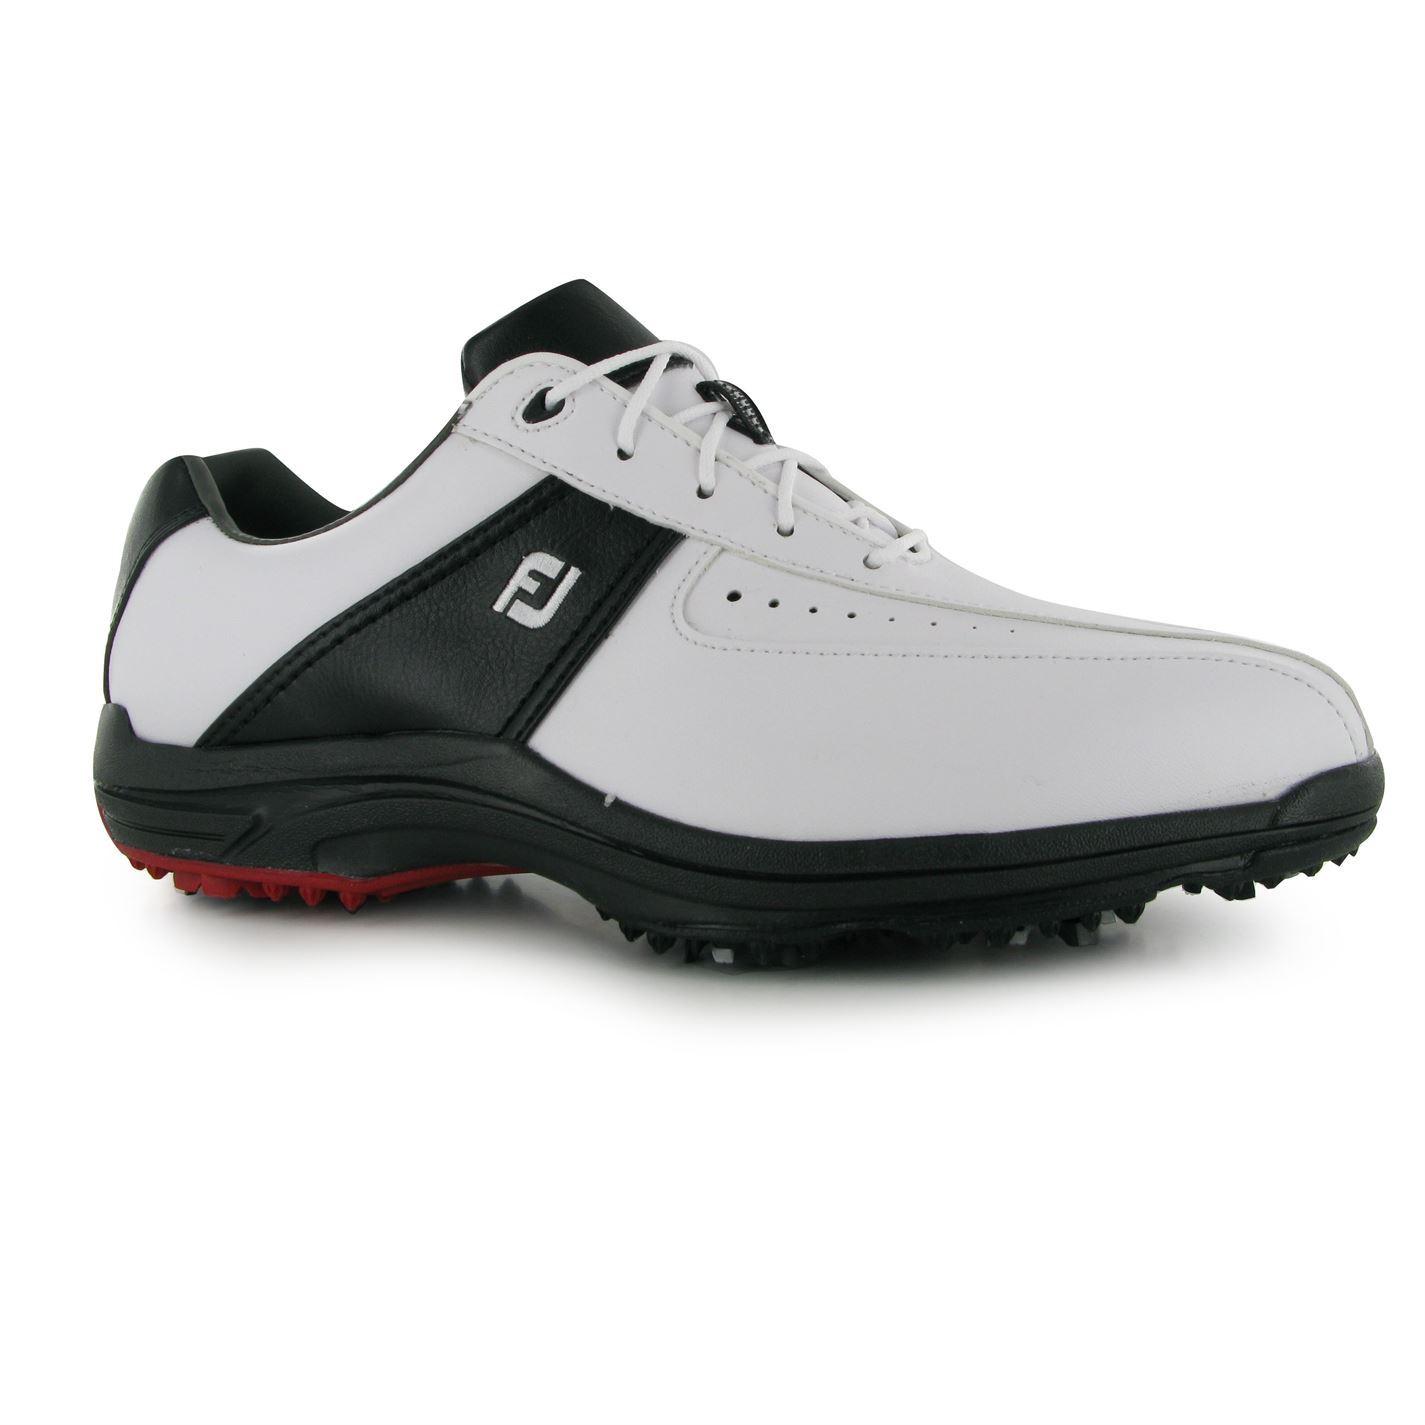 footjoy greenjoy golf shoes mens white black trainers